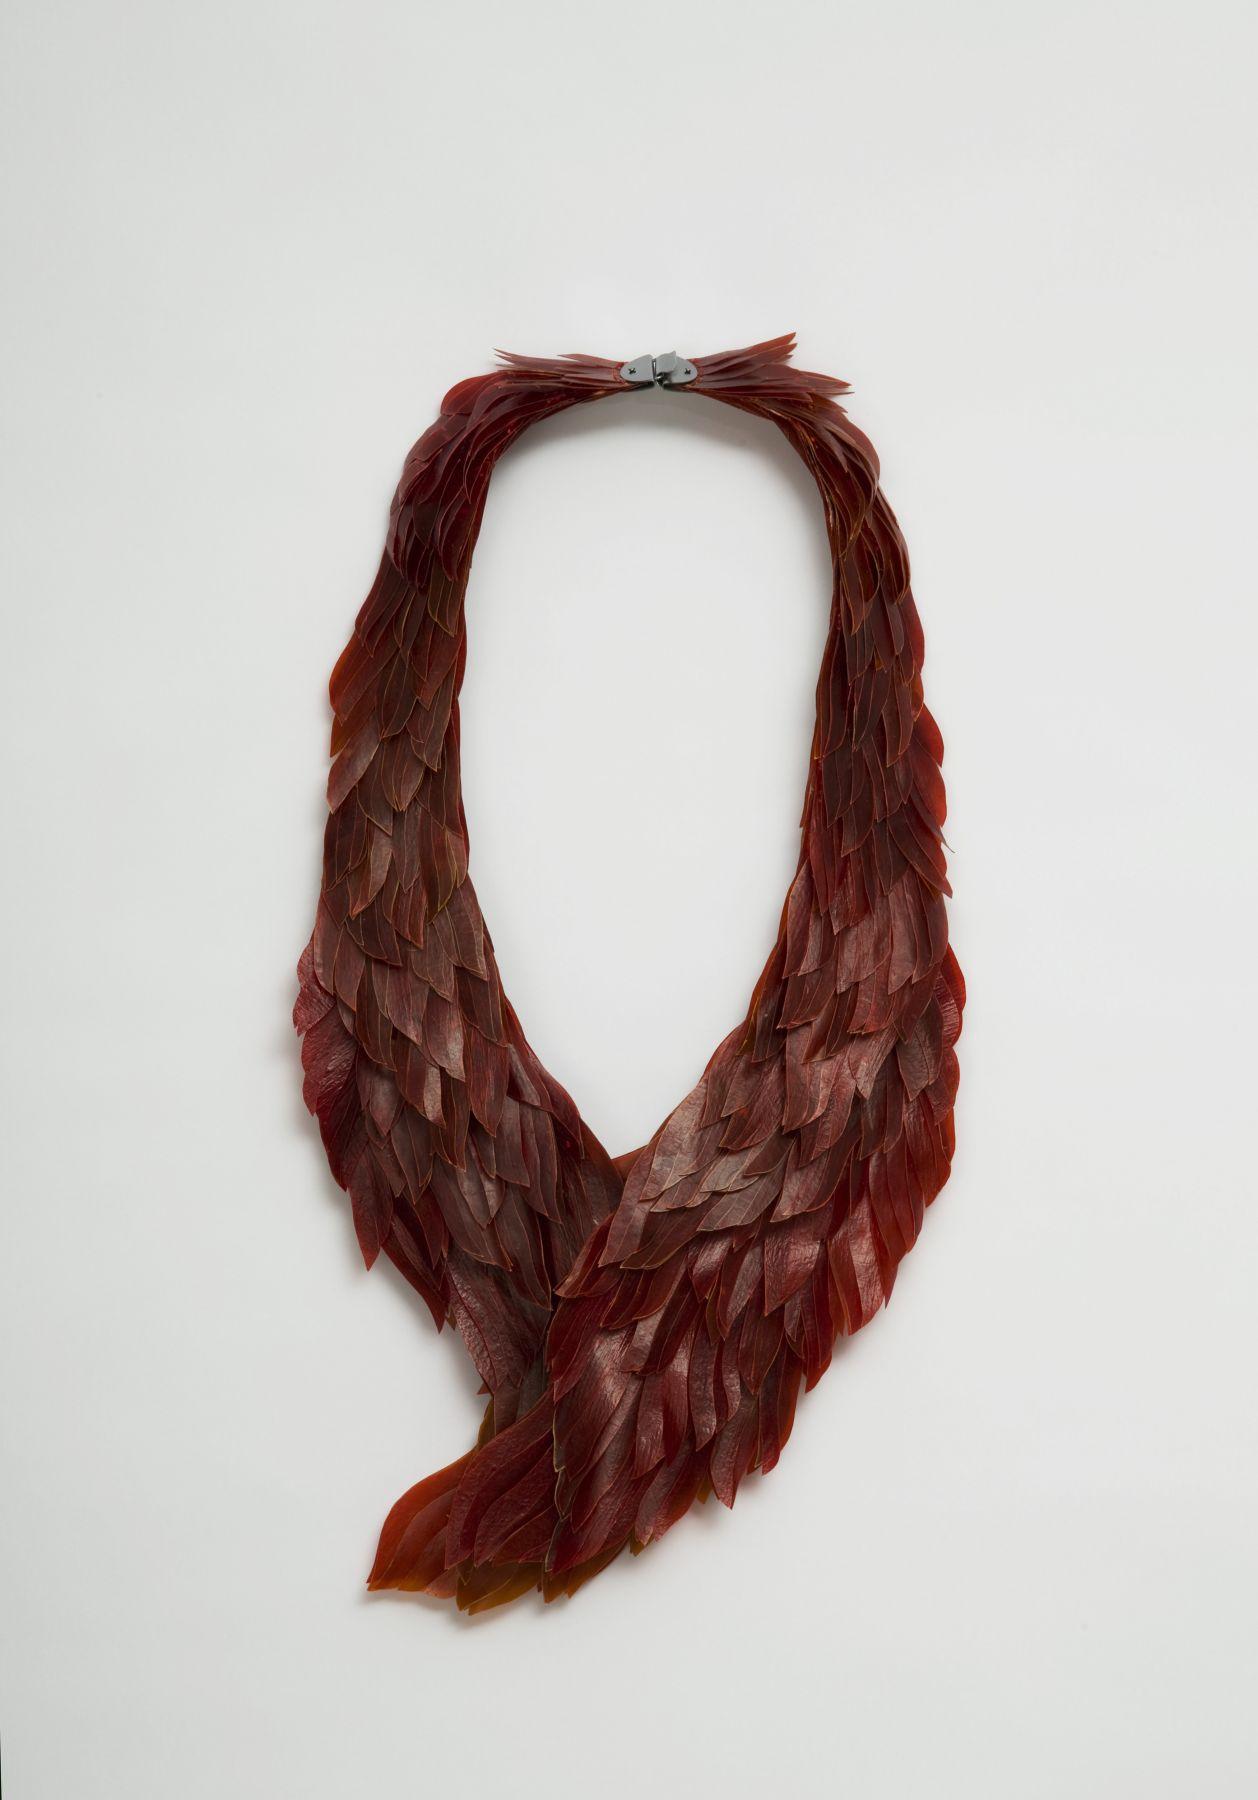 Eunmi Chun, Korea, Germany, necklace, cow intenstine, gut, wings feathers